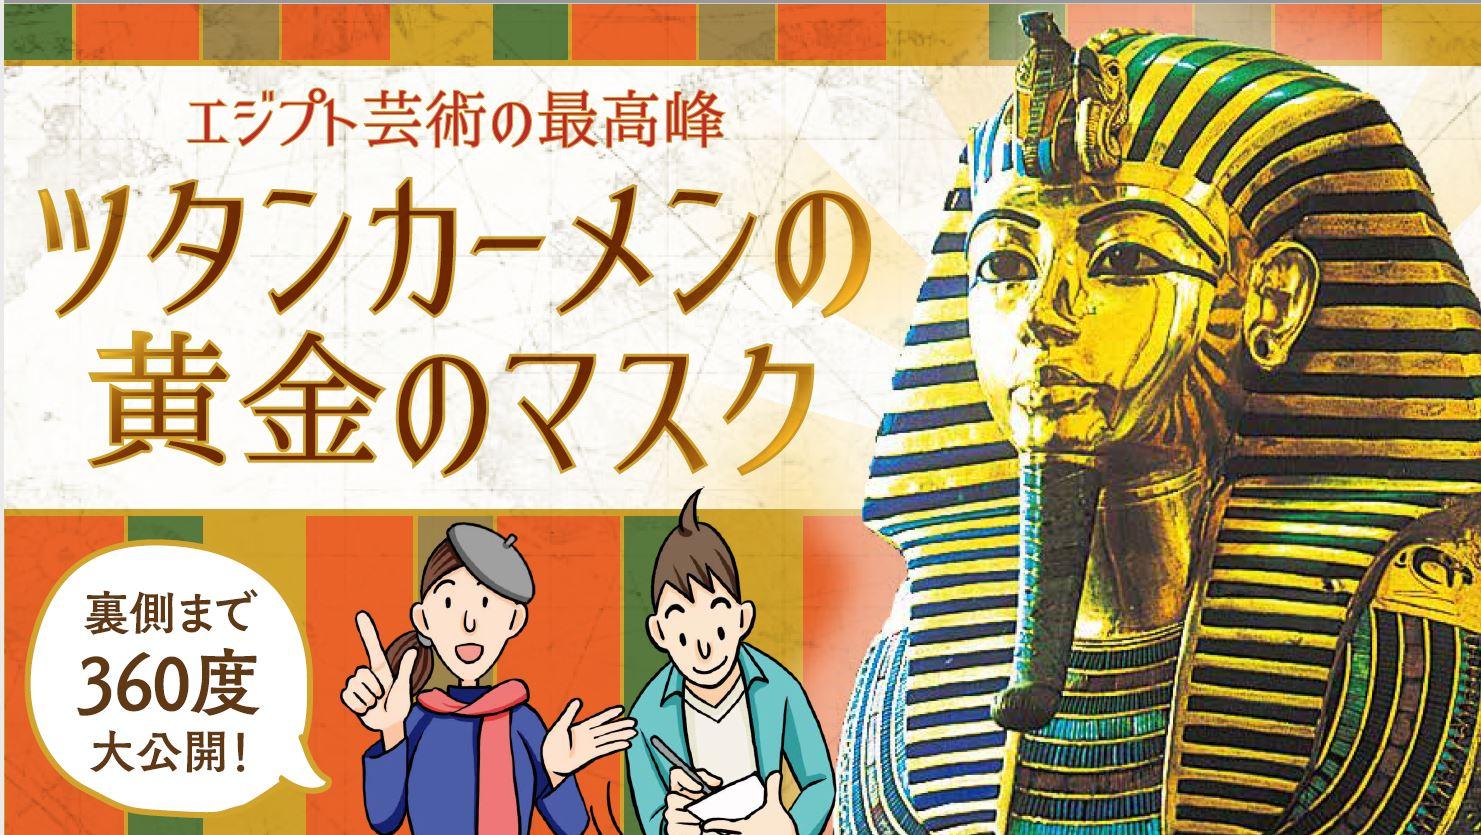 【CLUB海外/芸術】エジプト芸術の最高峰 ツタンカーメンの黄金のマスク